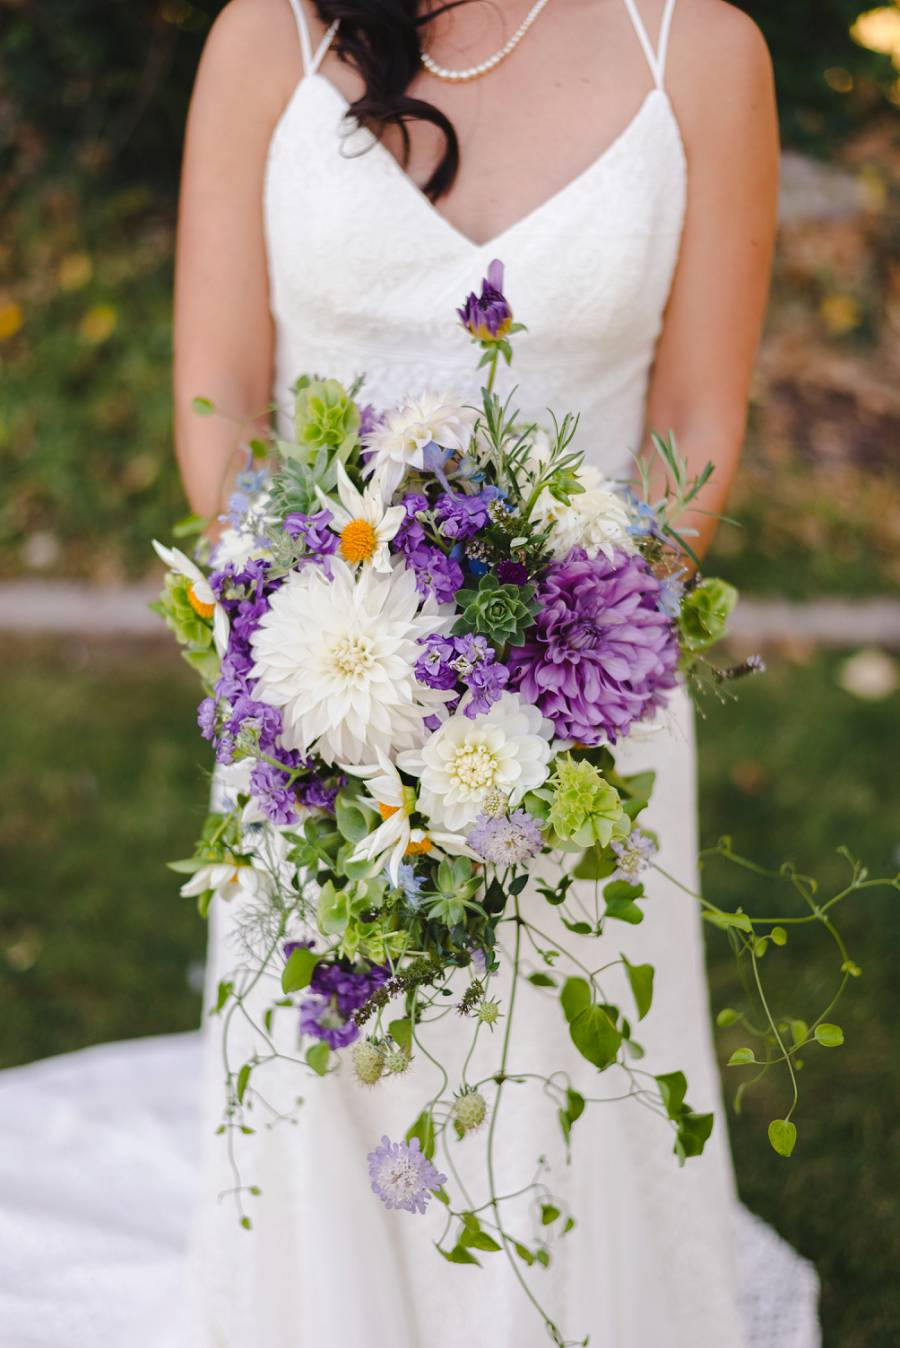 portrait of bride holding a bouquet of flowers